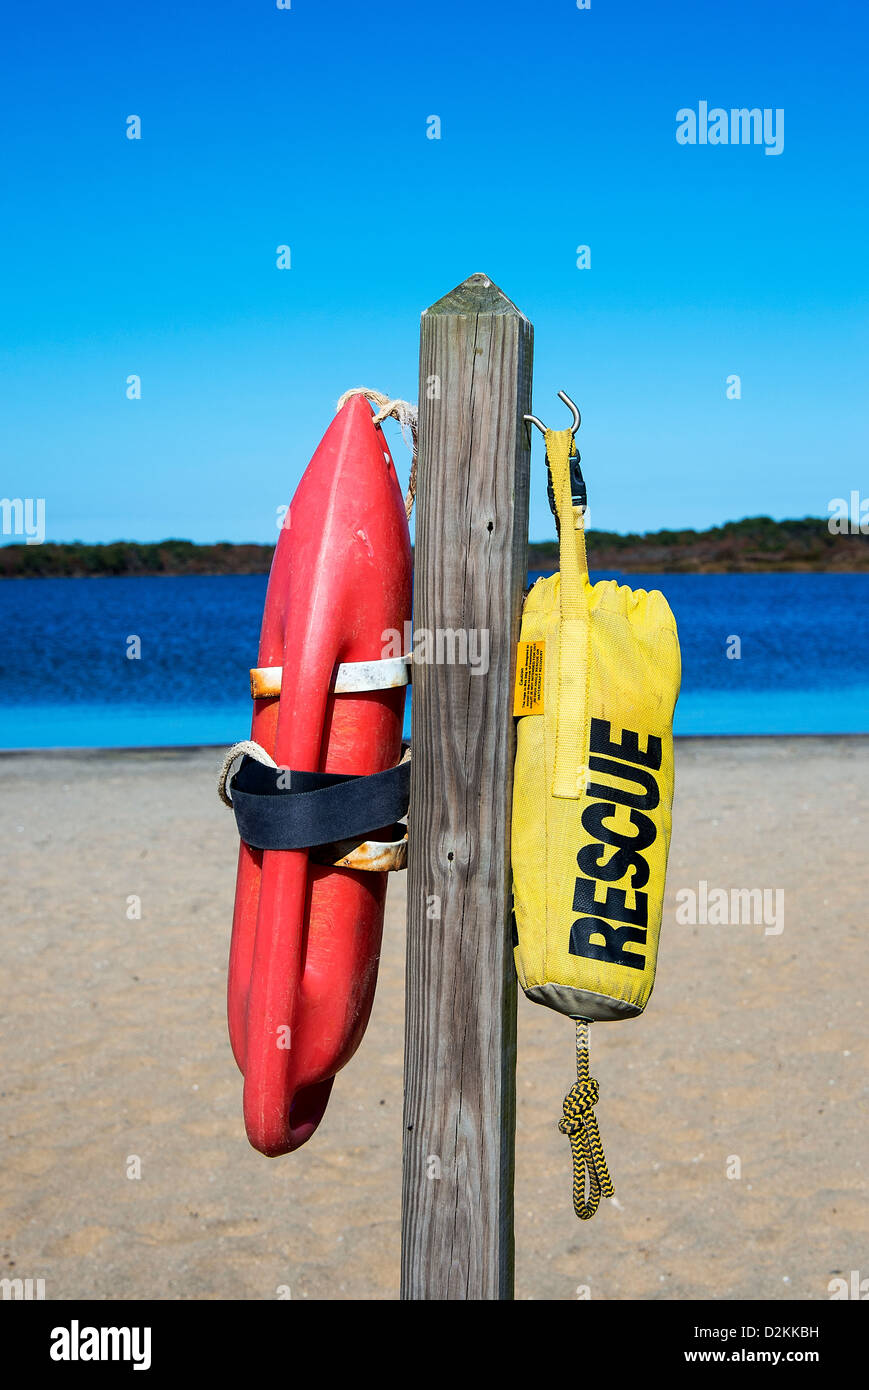 Flotadores de rescate en una playa, Massachusetts, EE.UU. Foto de stock